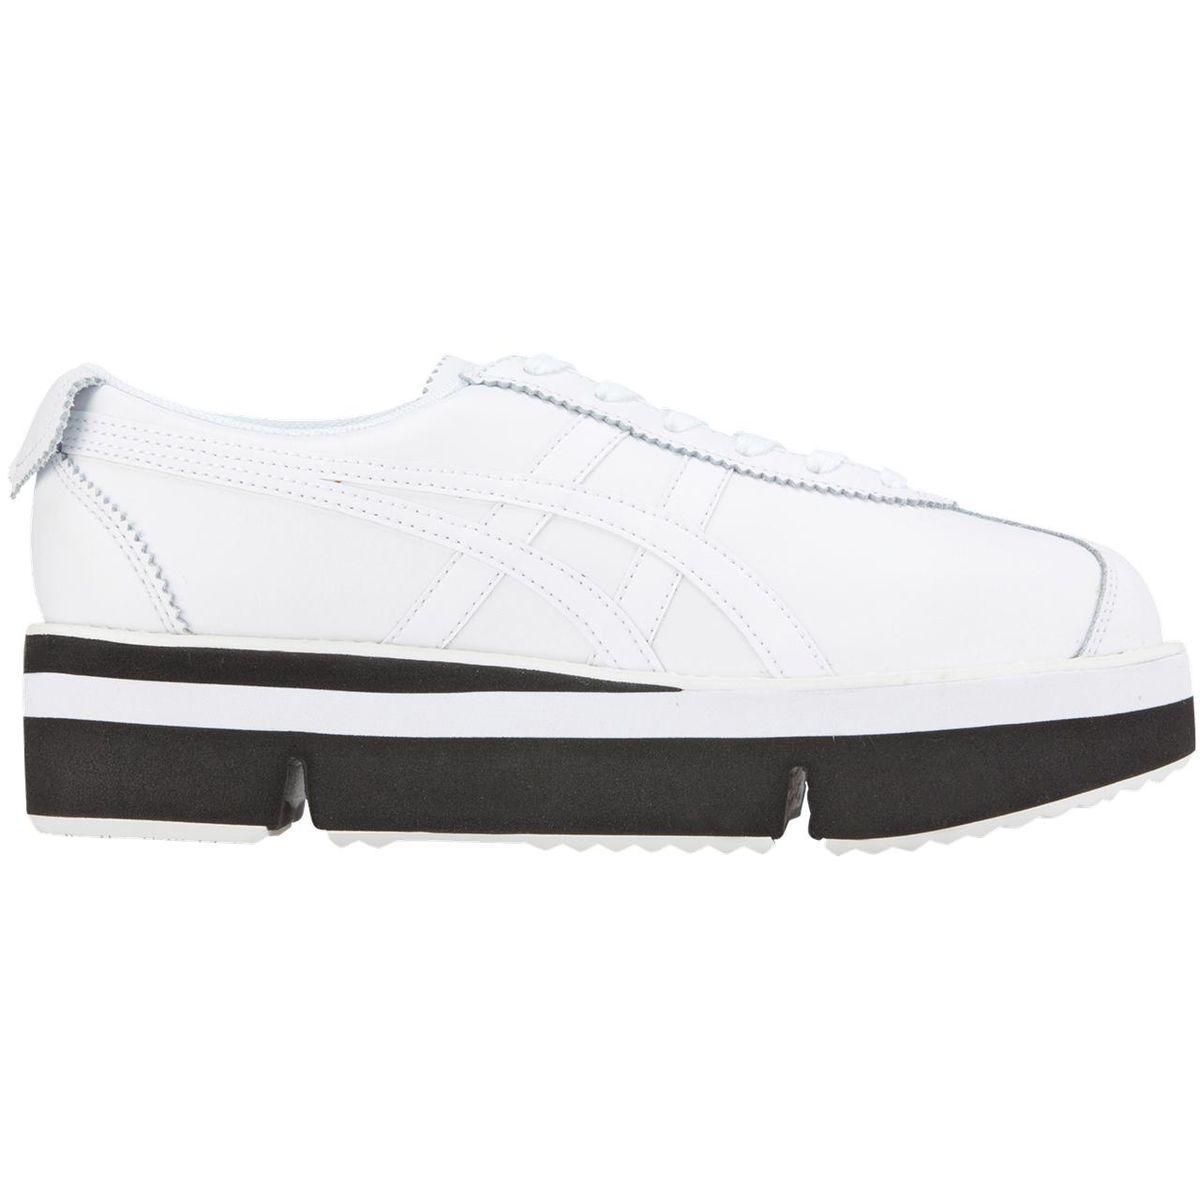 Tenis-Onitsuka-Tiger-Pokkuri-Sneaker-PF